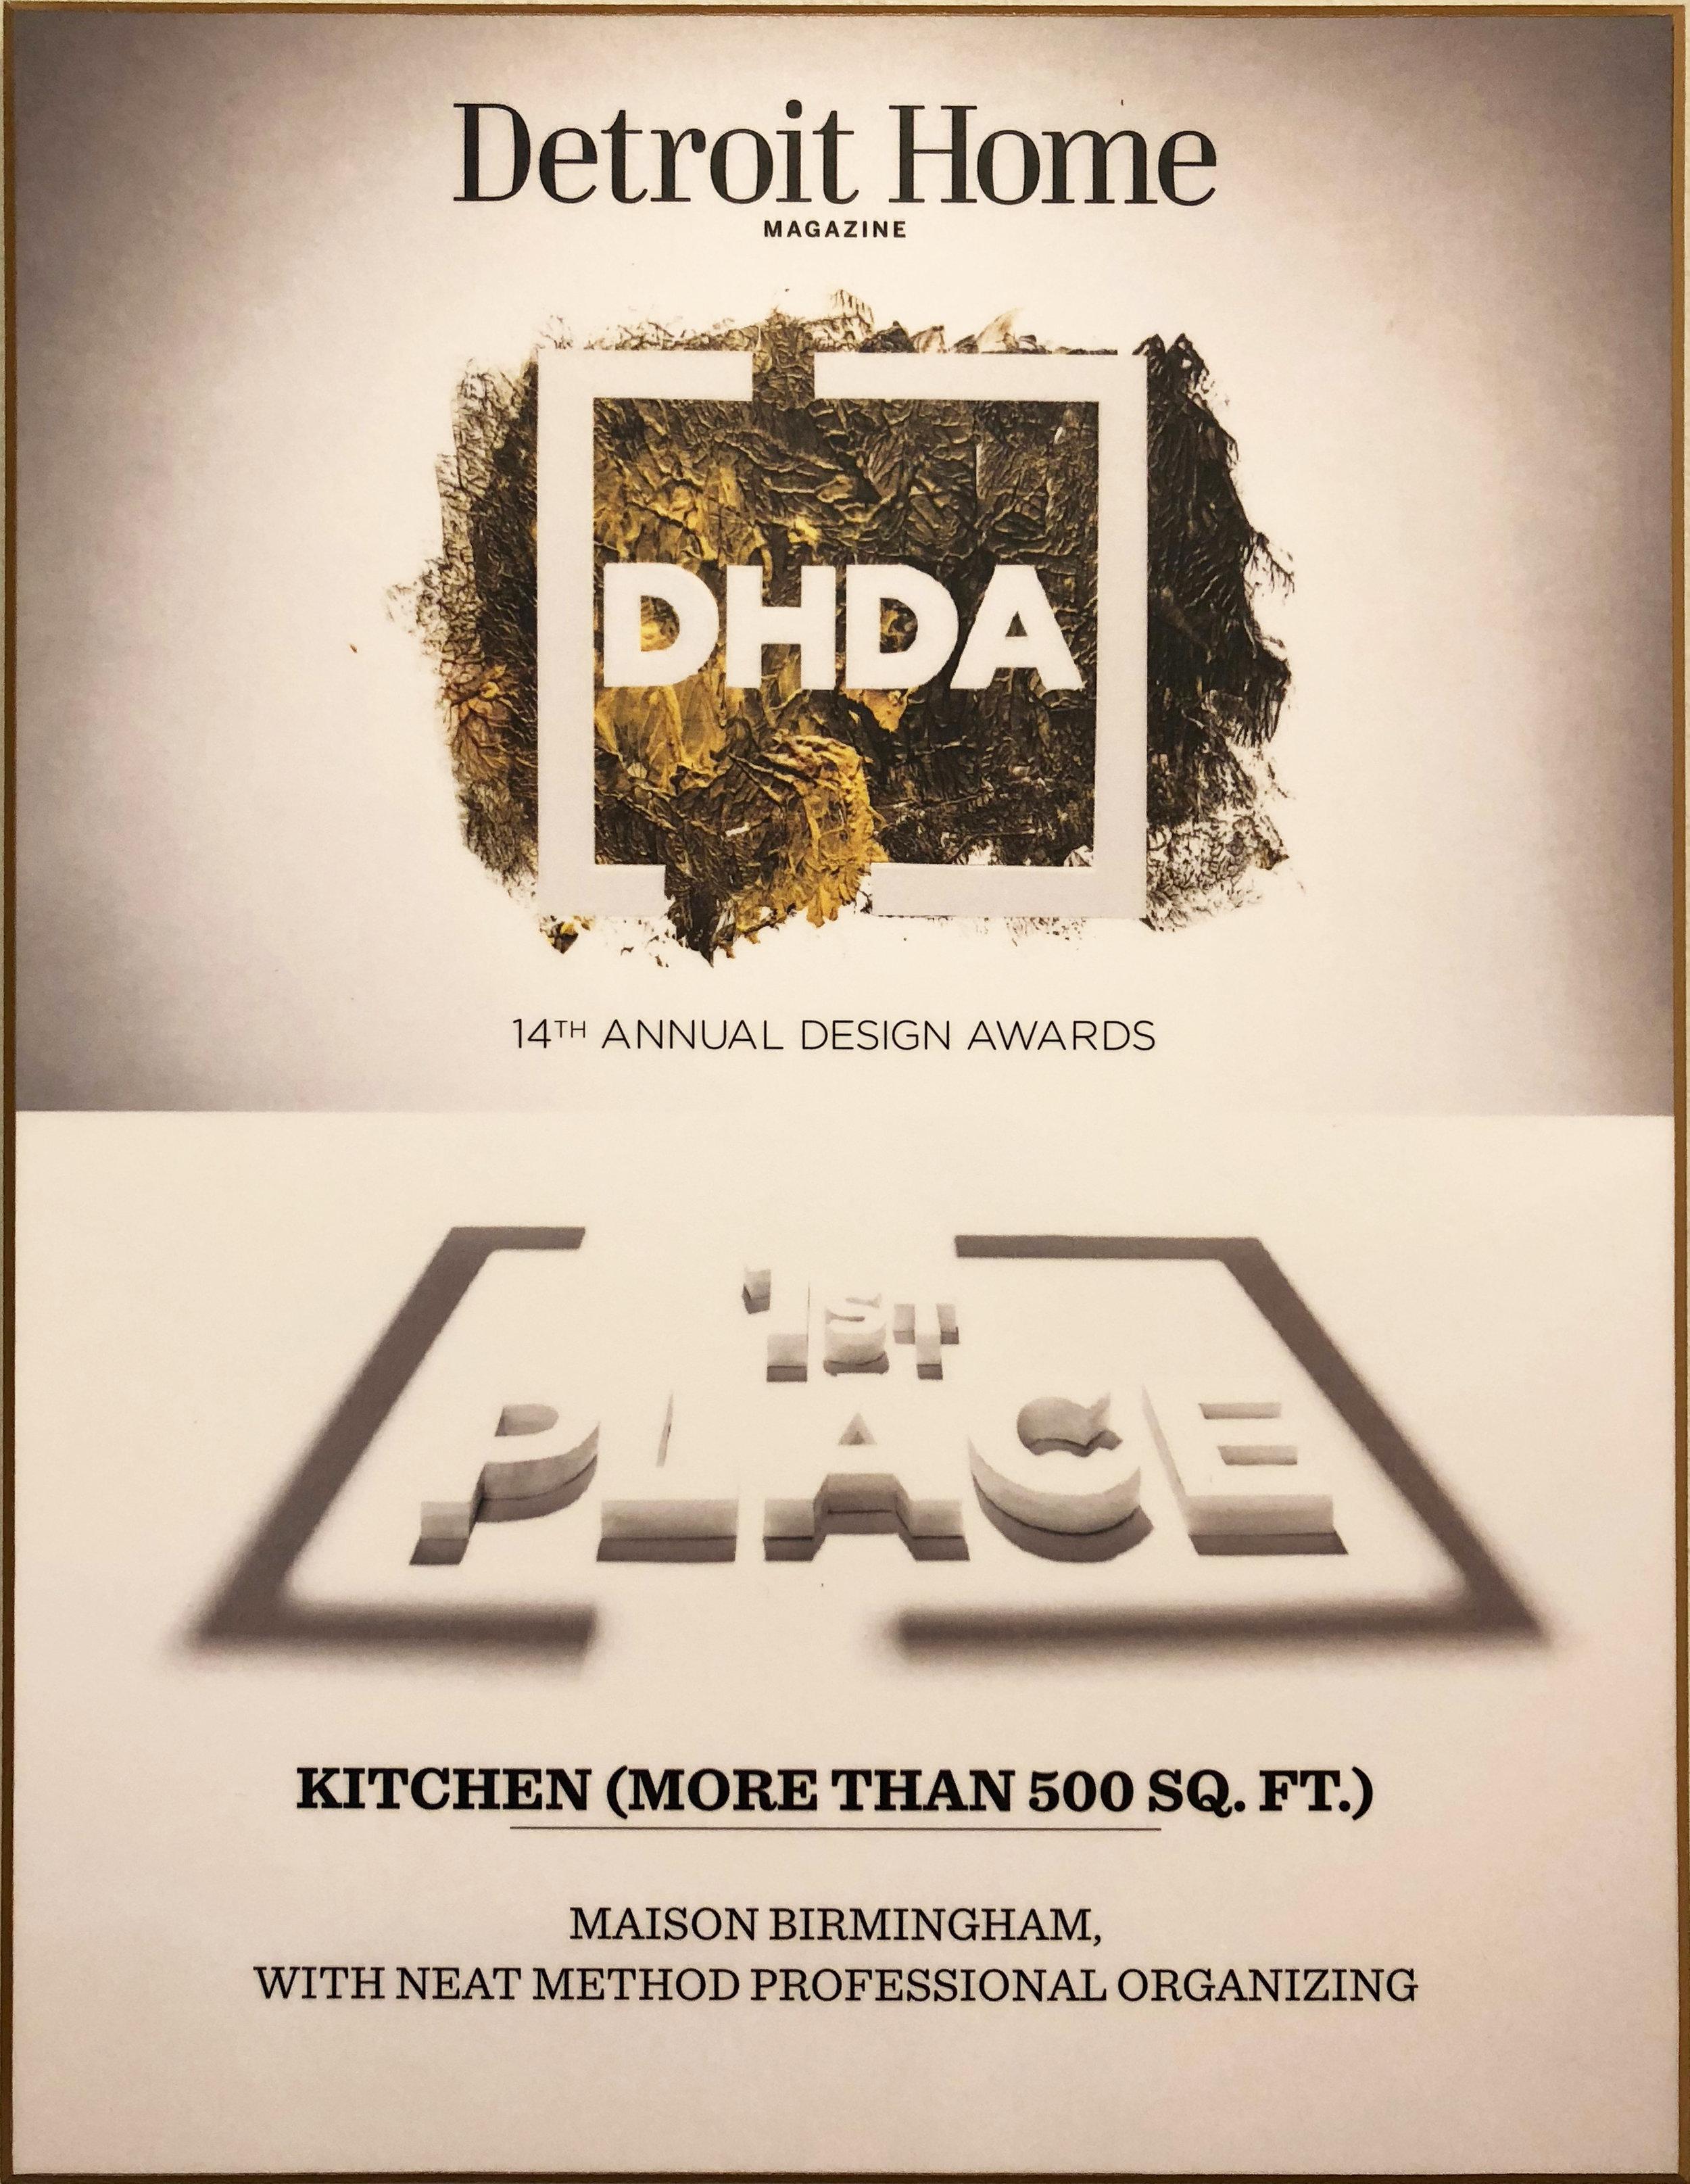 kitchen more than 500sf.jpg